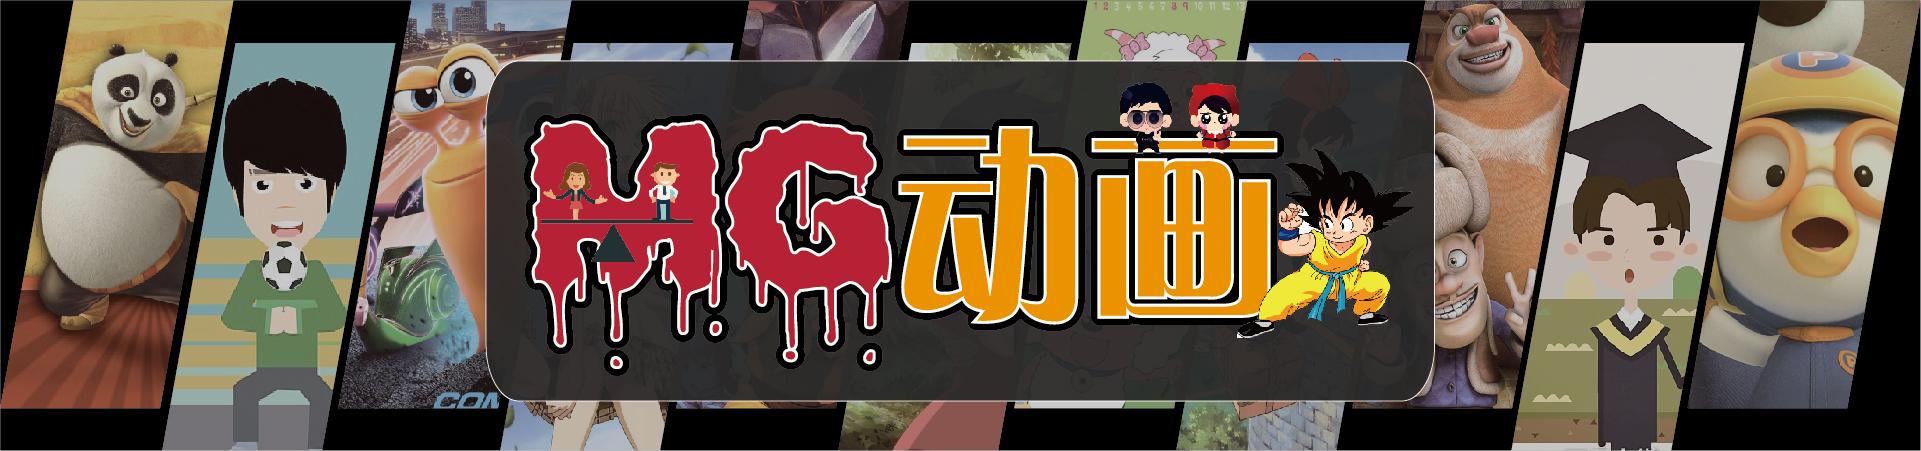 3d三维亚虎个人娱乐中心亚虎新版官方网app下载